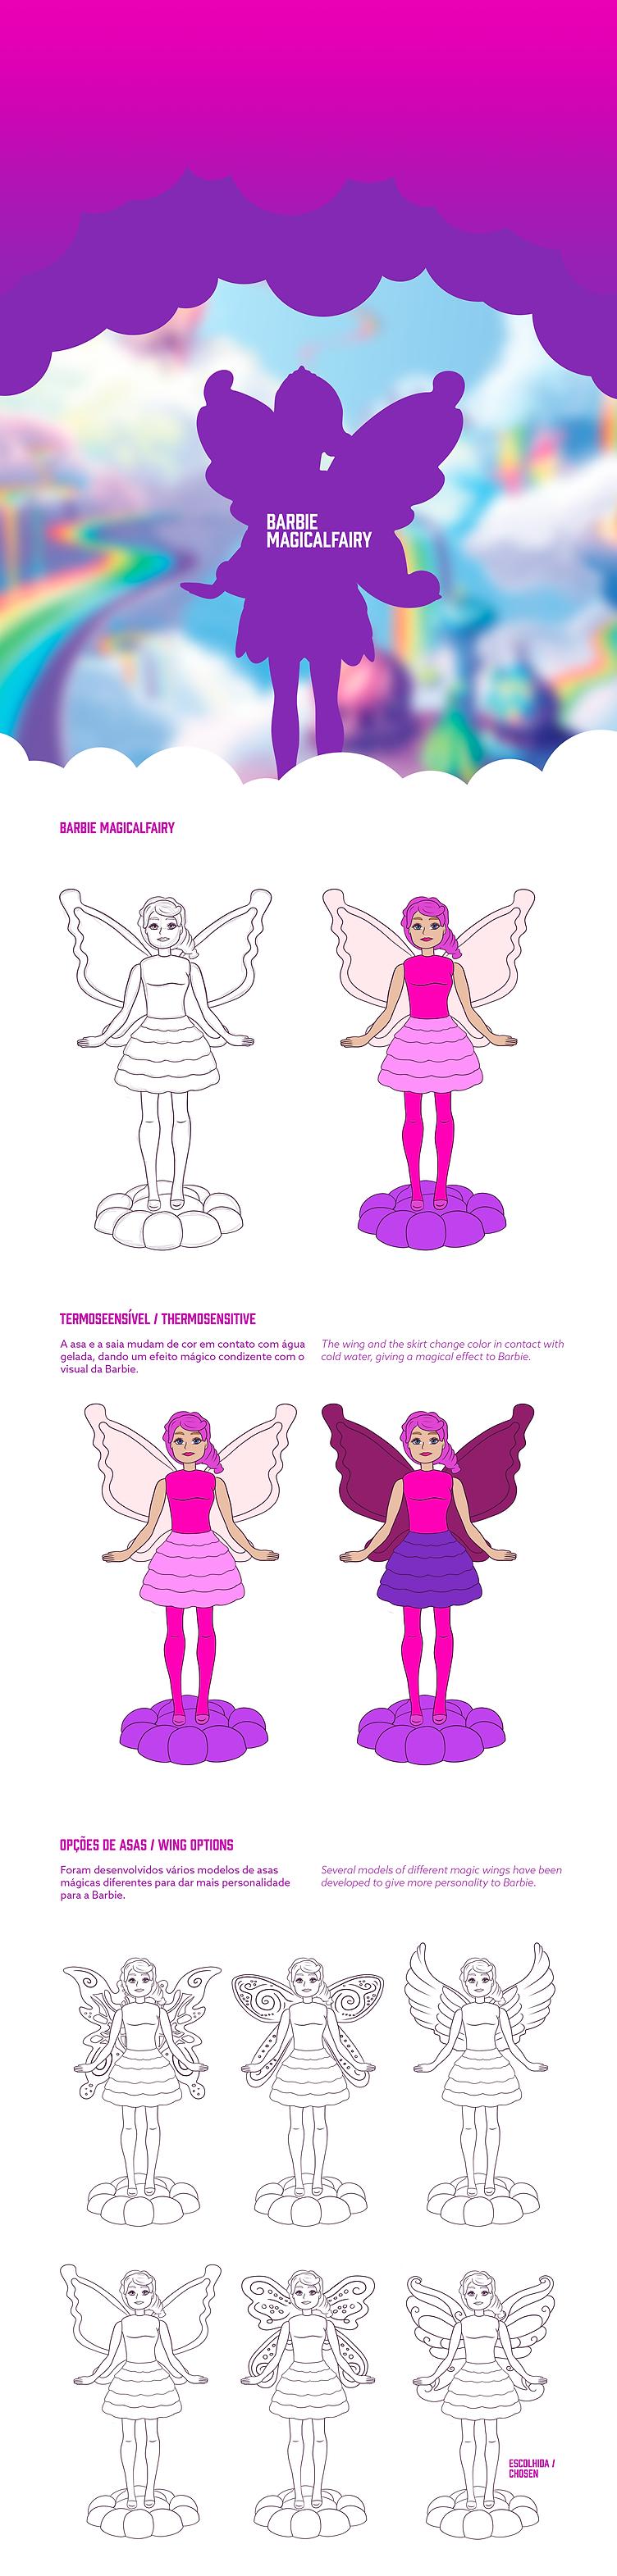 Behance---Barbie-Clouds---04A.png